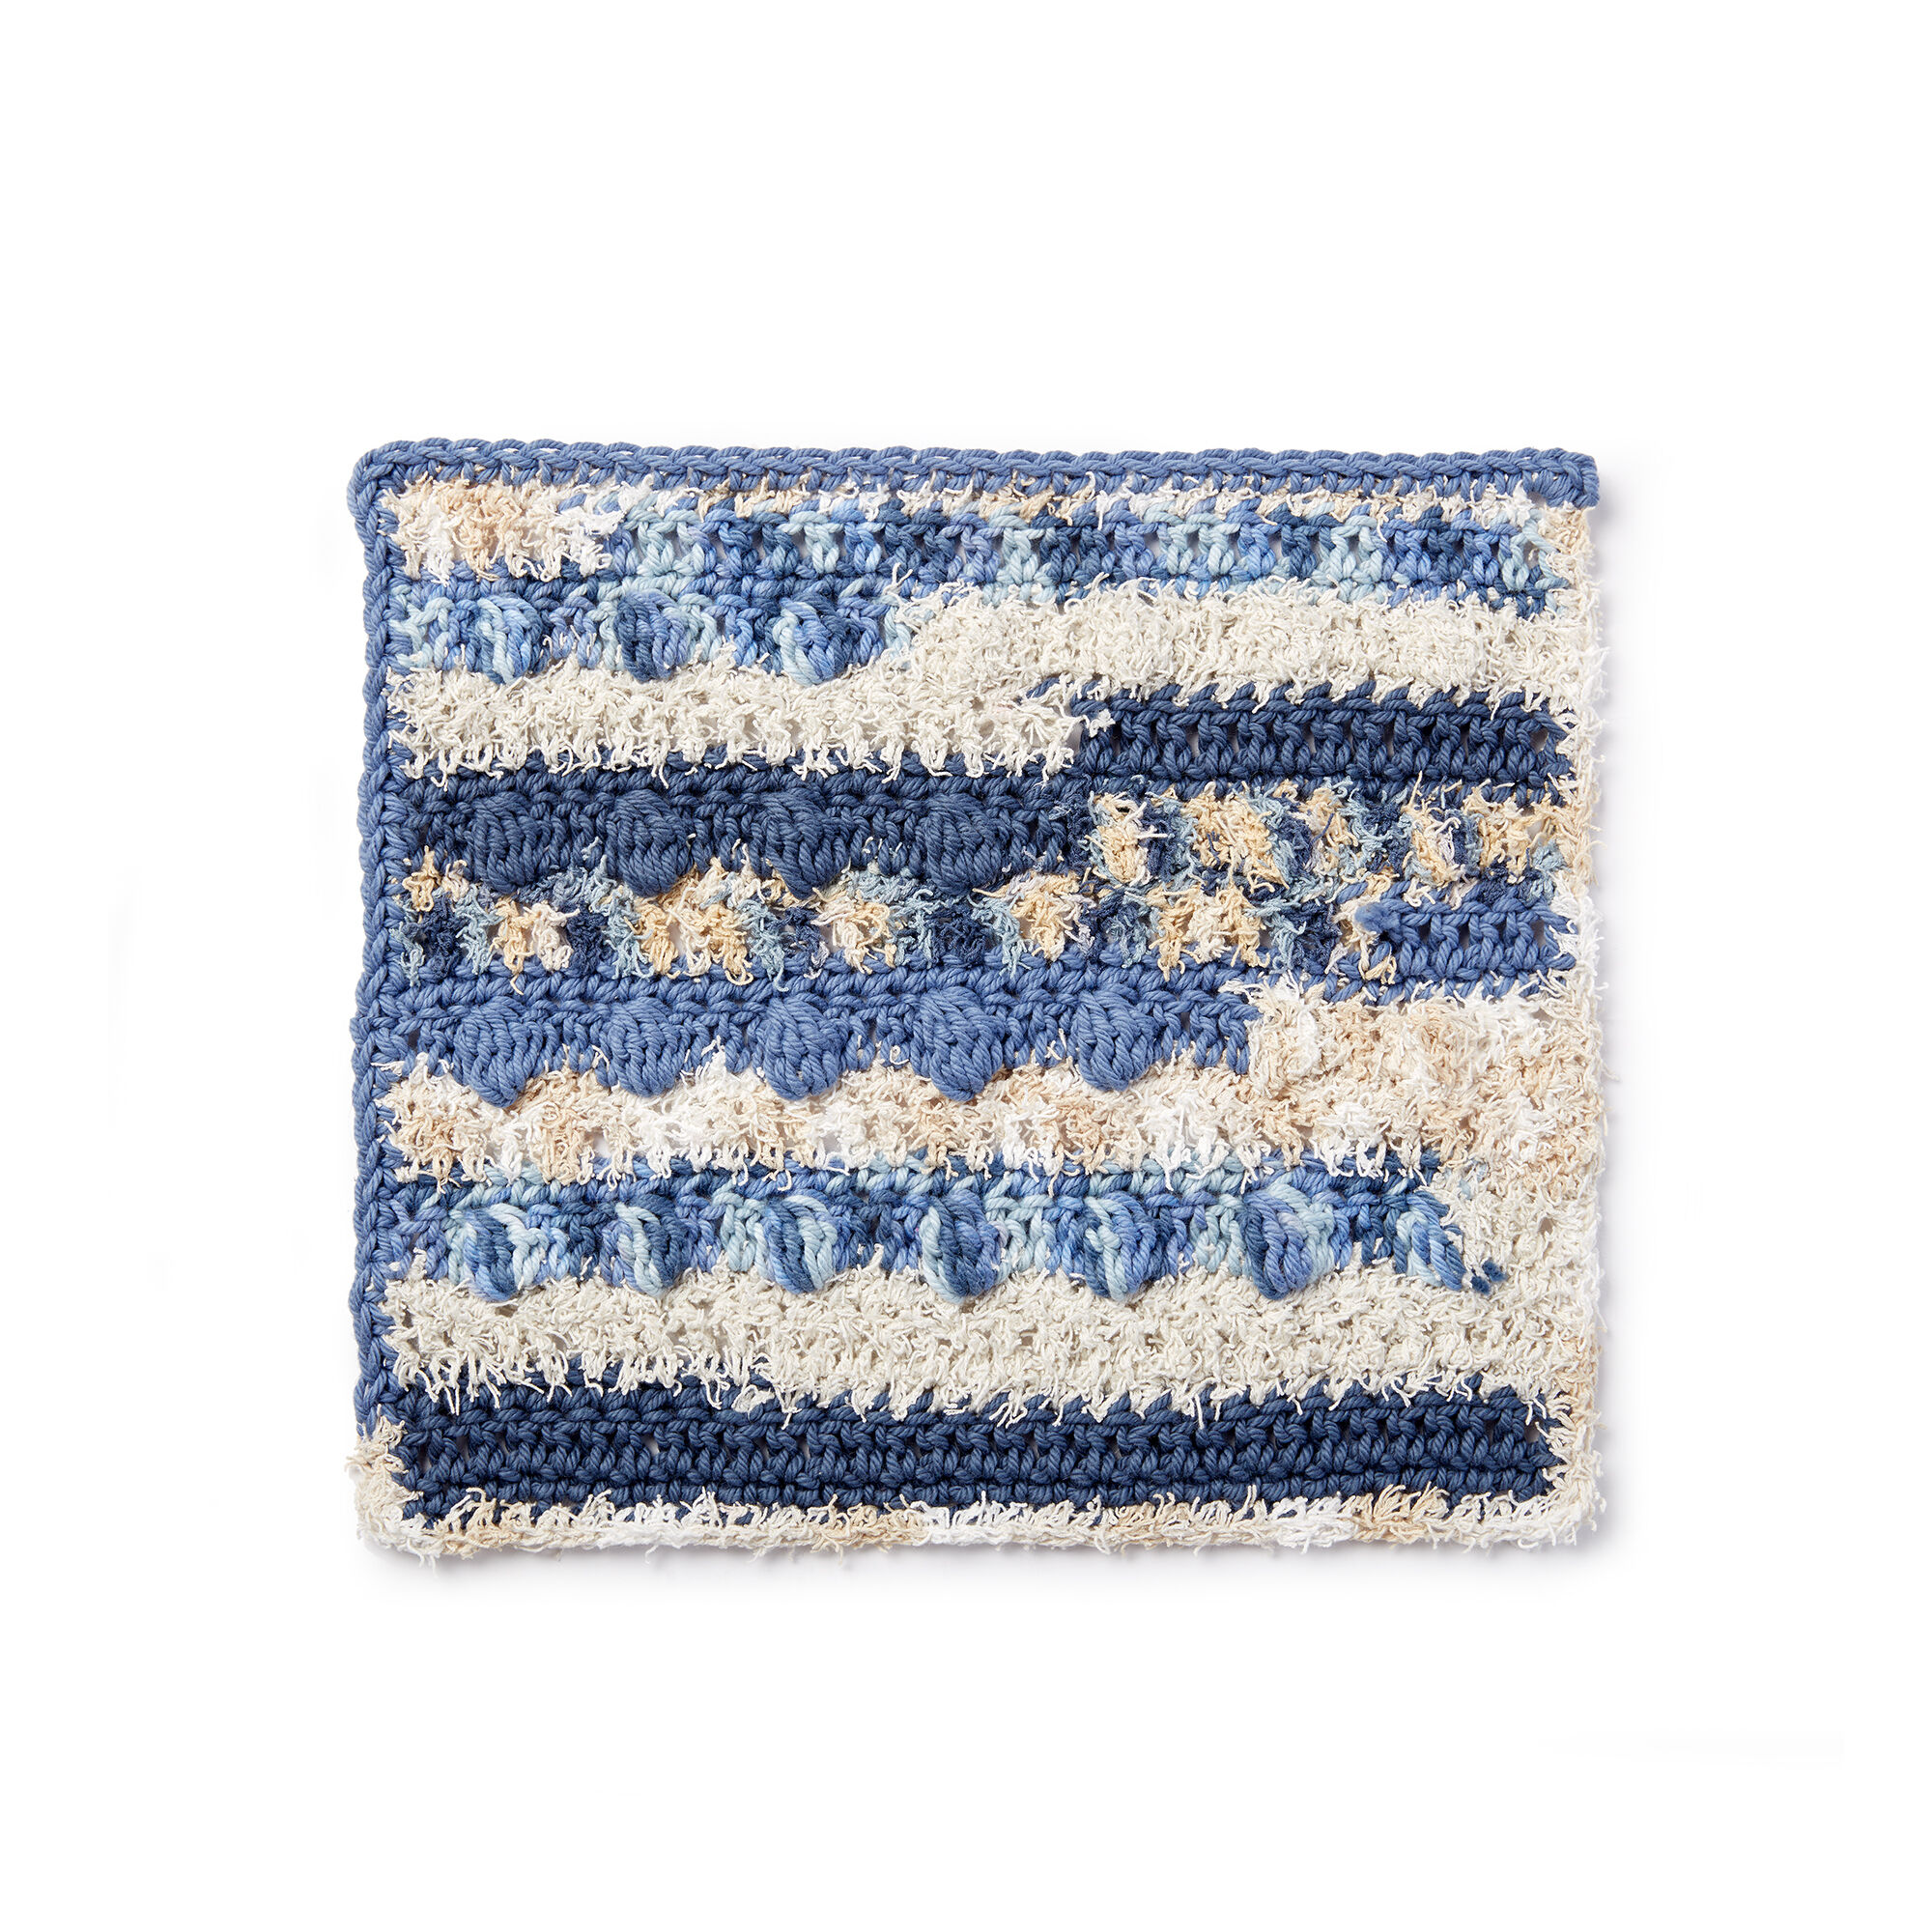 Lily Sugarn Cream Scrubbing Bobbles Crochet Dishcloth Pattern